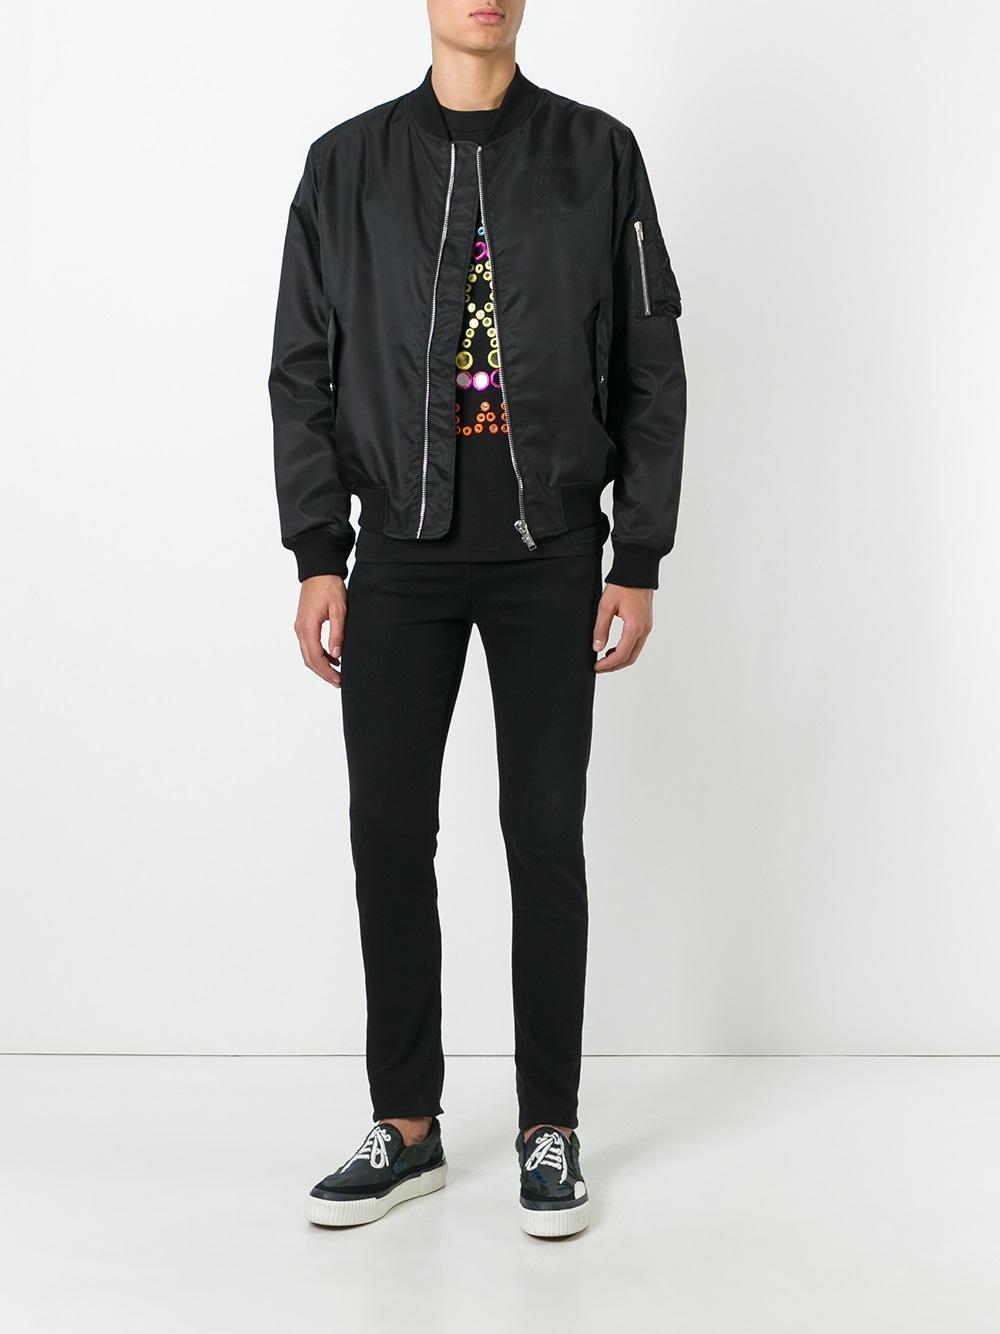 Moschino Cotton Logo Bomber Jacket in Black for Men